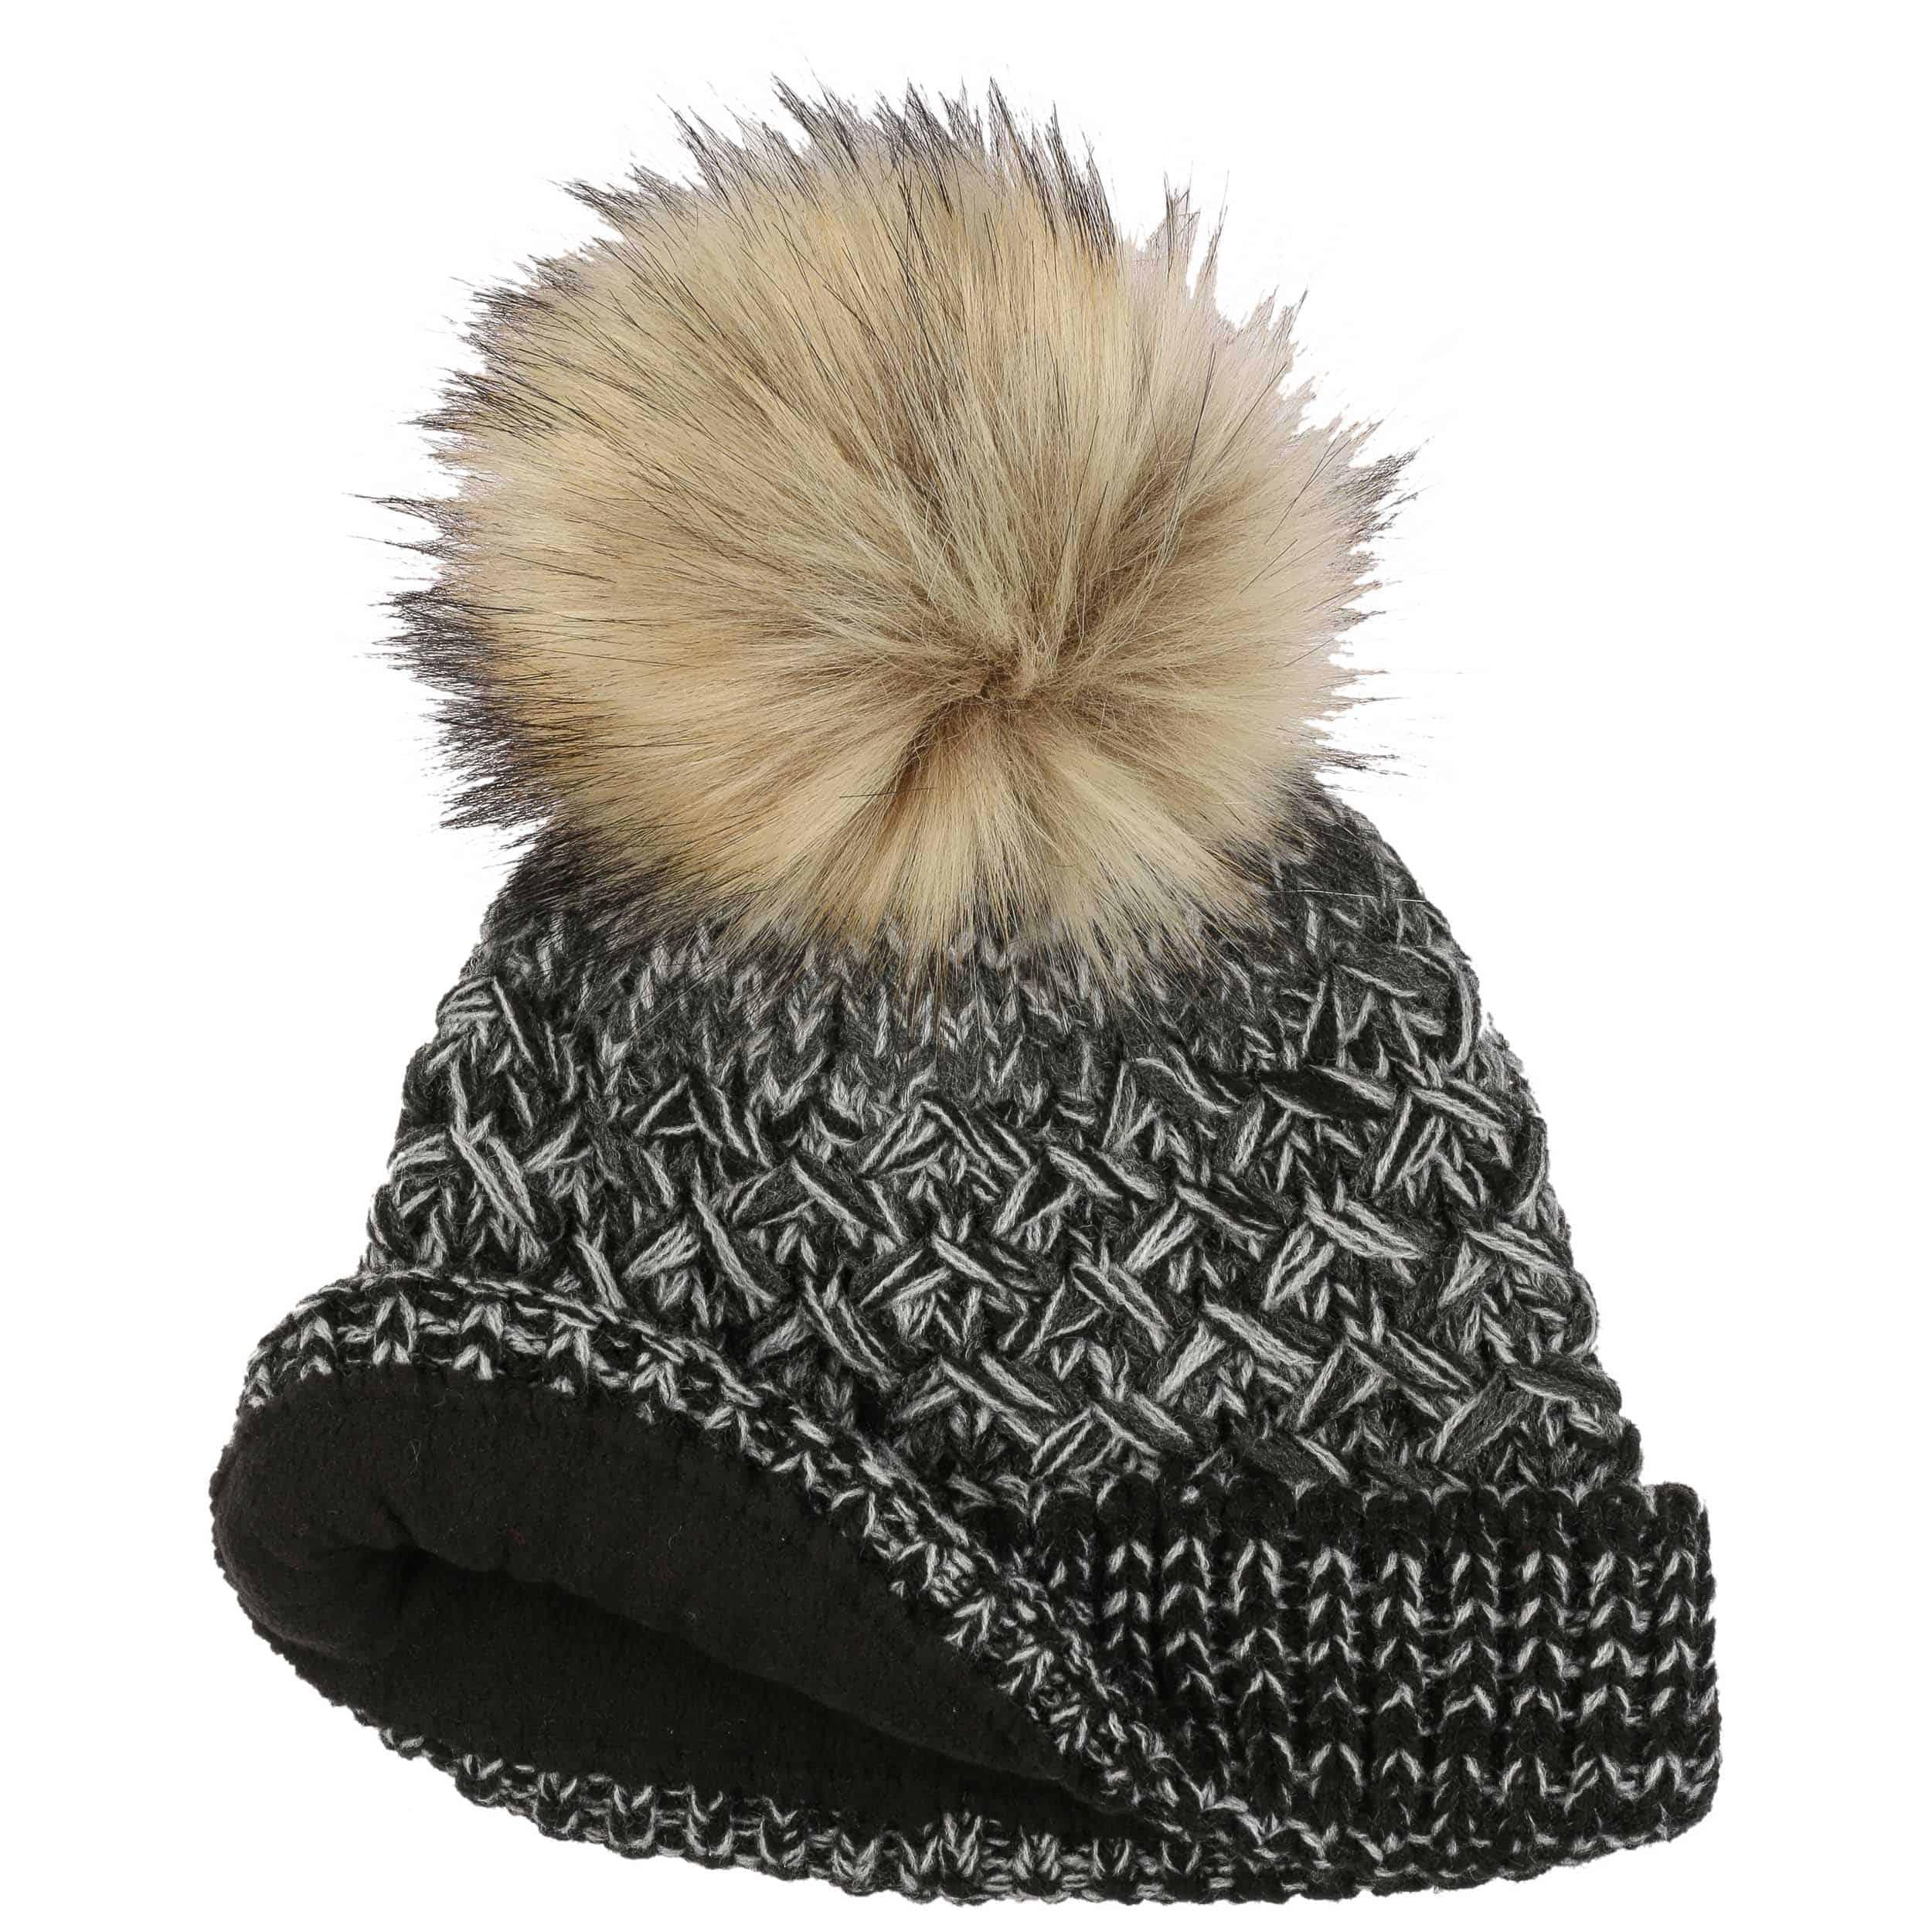 17c4b8356c8a9 Multimélange Wool Pompom Hat by Seeberger